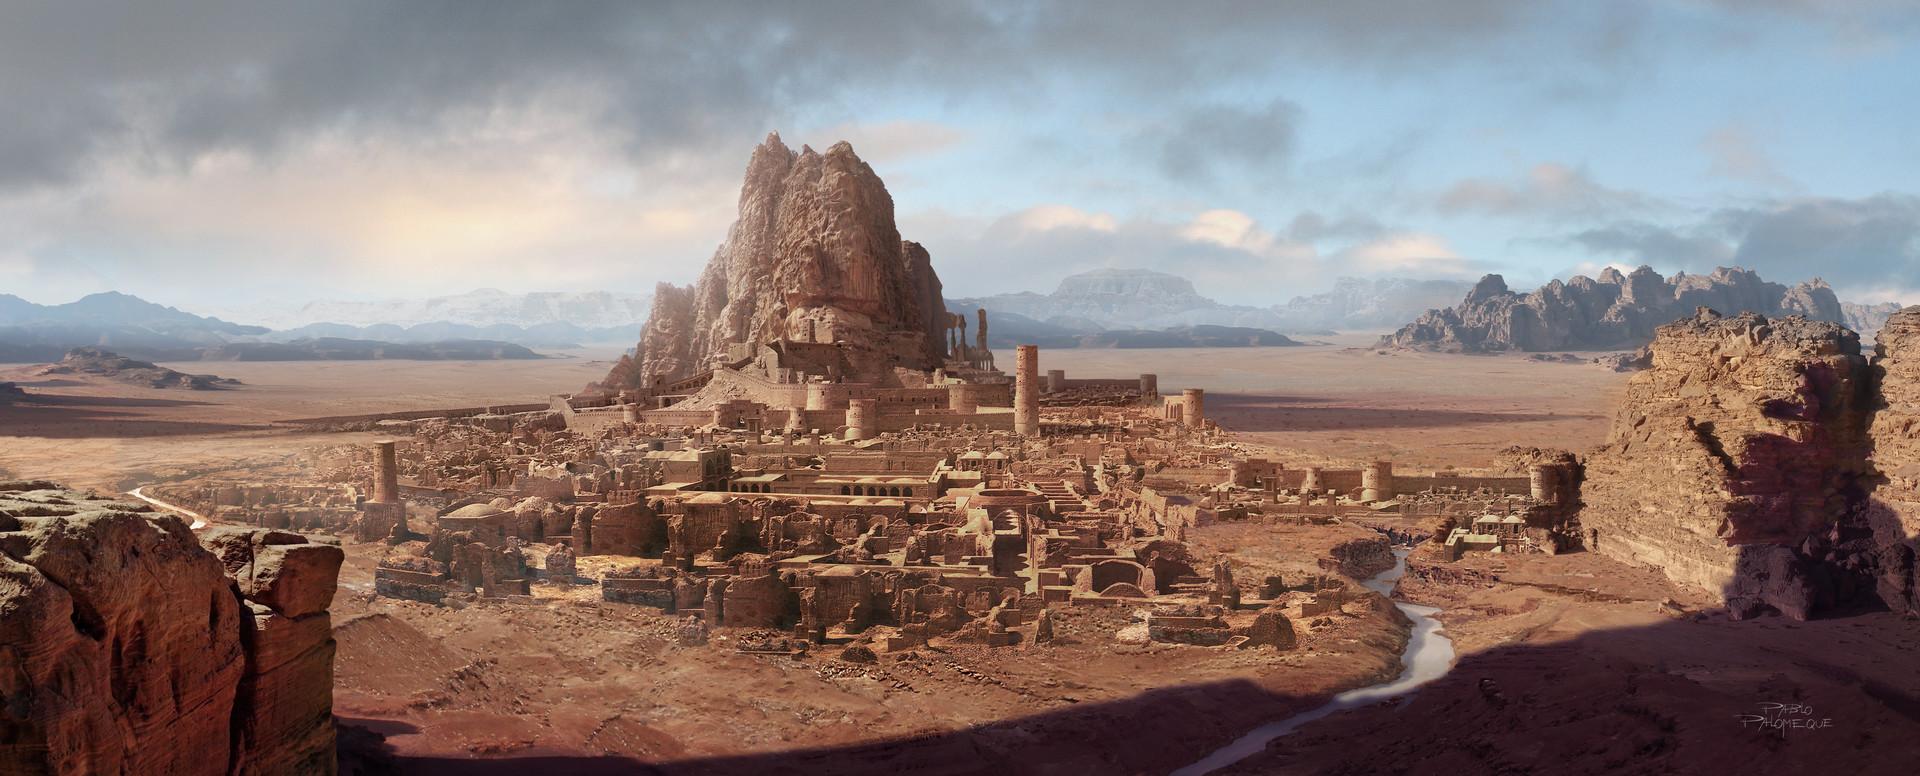 Pablo palomeque desert ruins